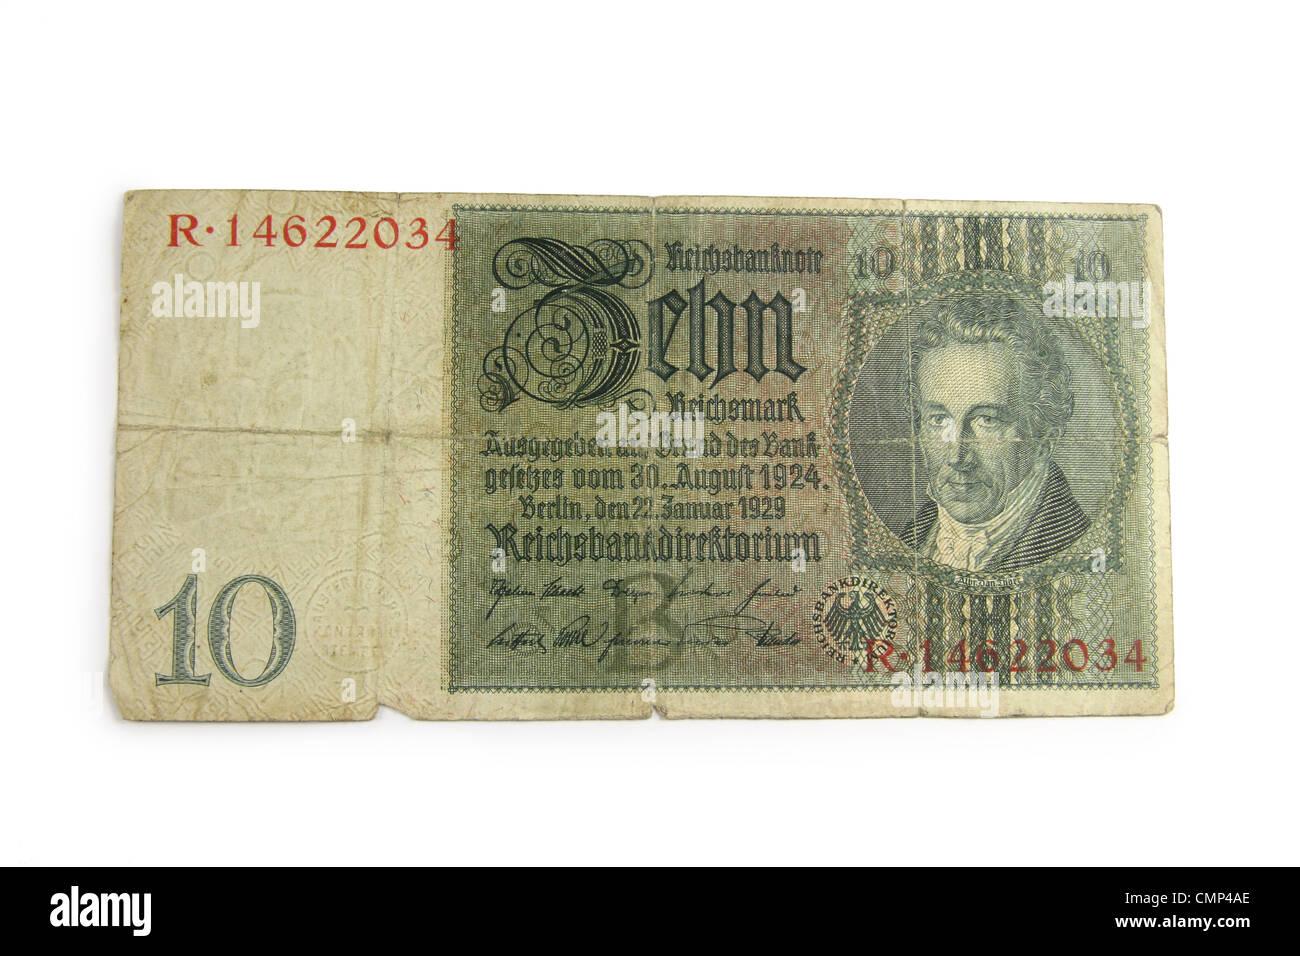 "German 1929 ""10 Mark"" bill from the Reichsbank. Stock Photo"